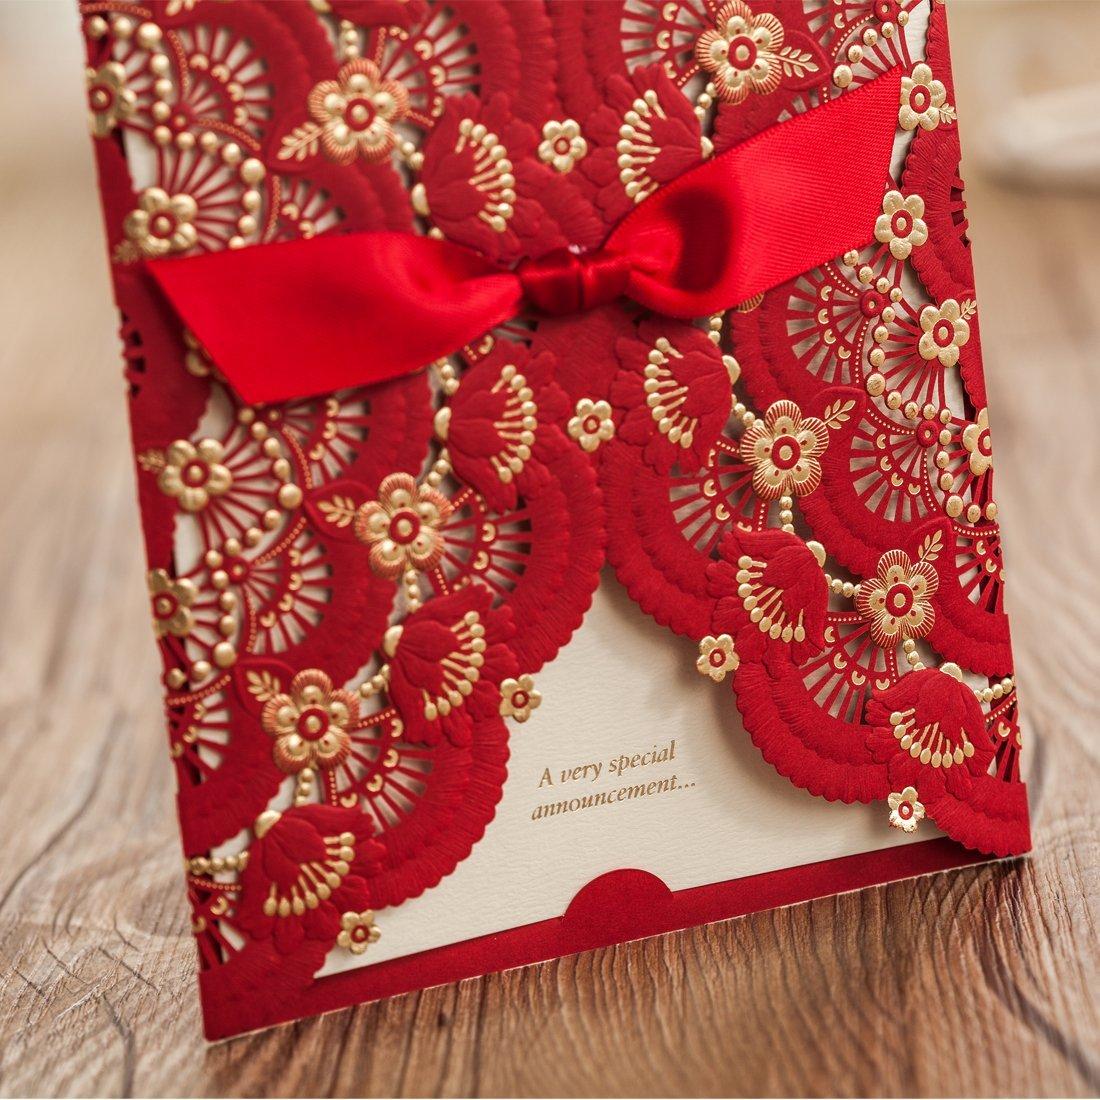 Amazon.com: Wishmade 50x Elegant Red Laser Cut Wedding Invitations ...